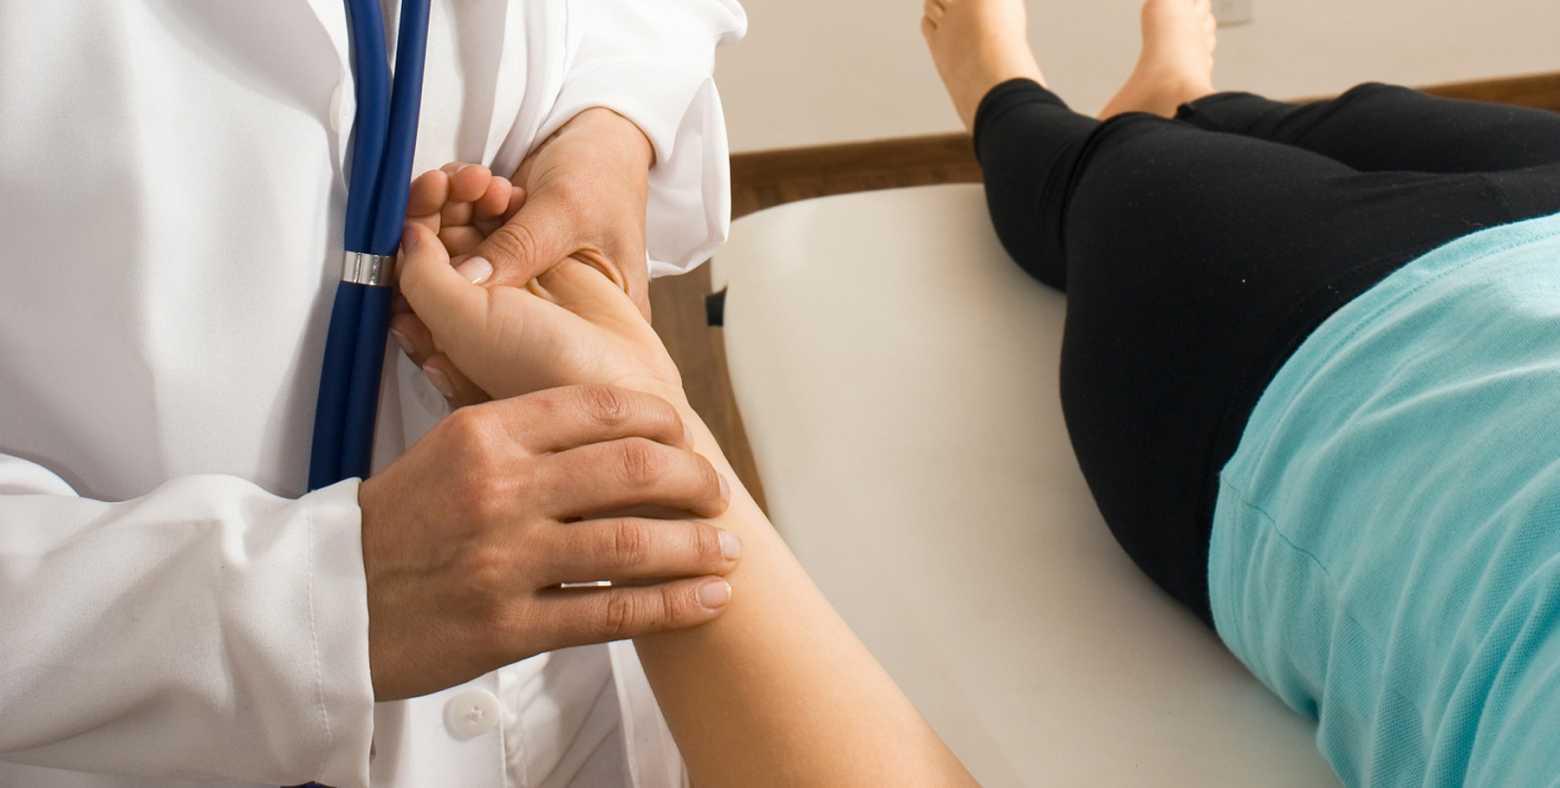 Nurse checks patient's pulse